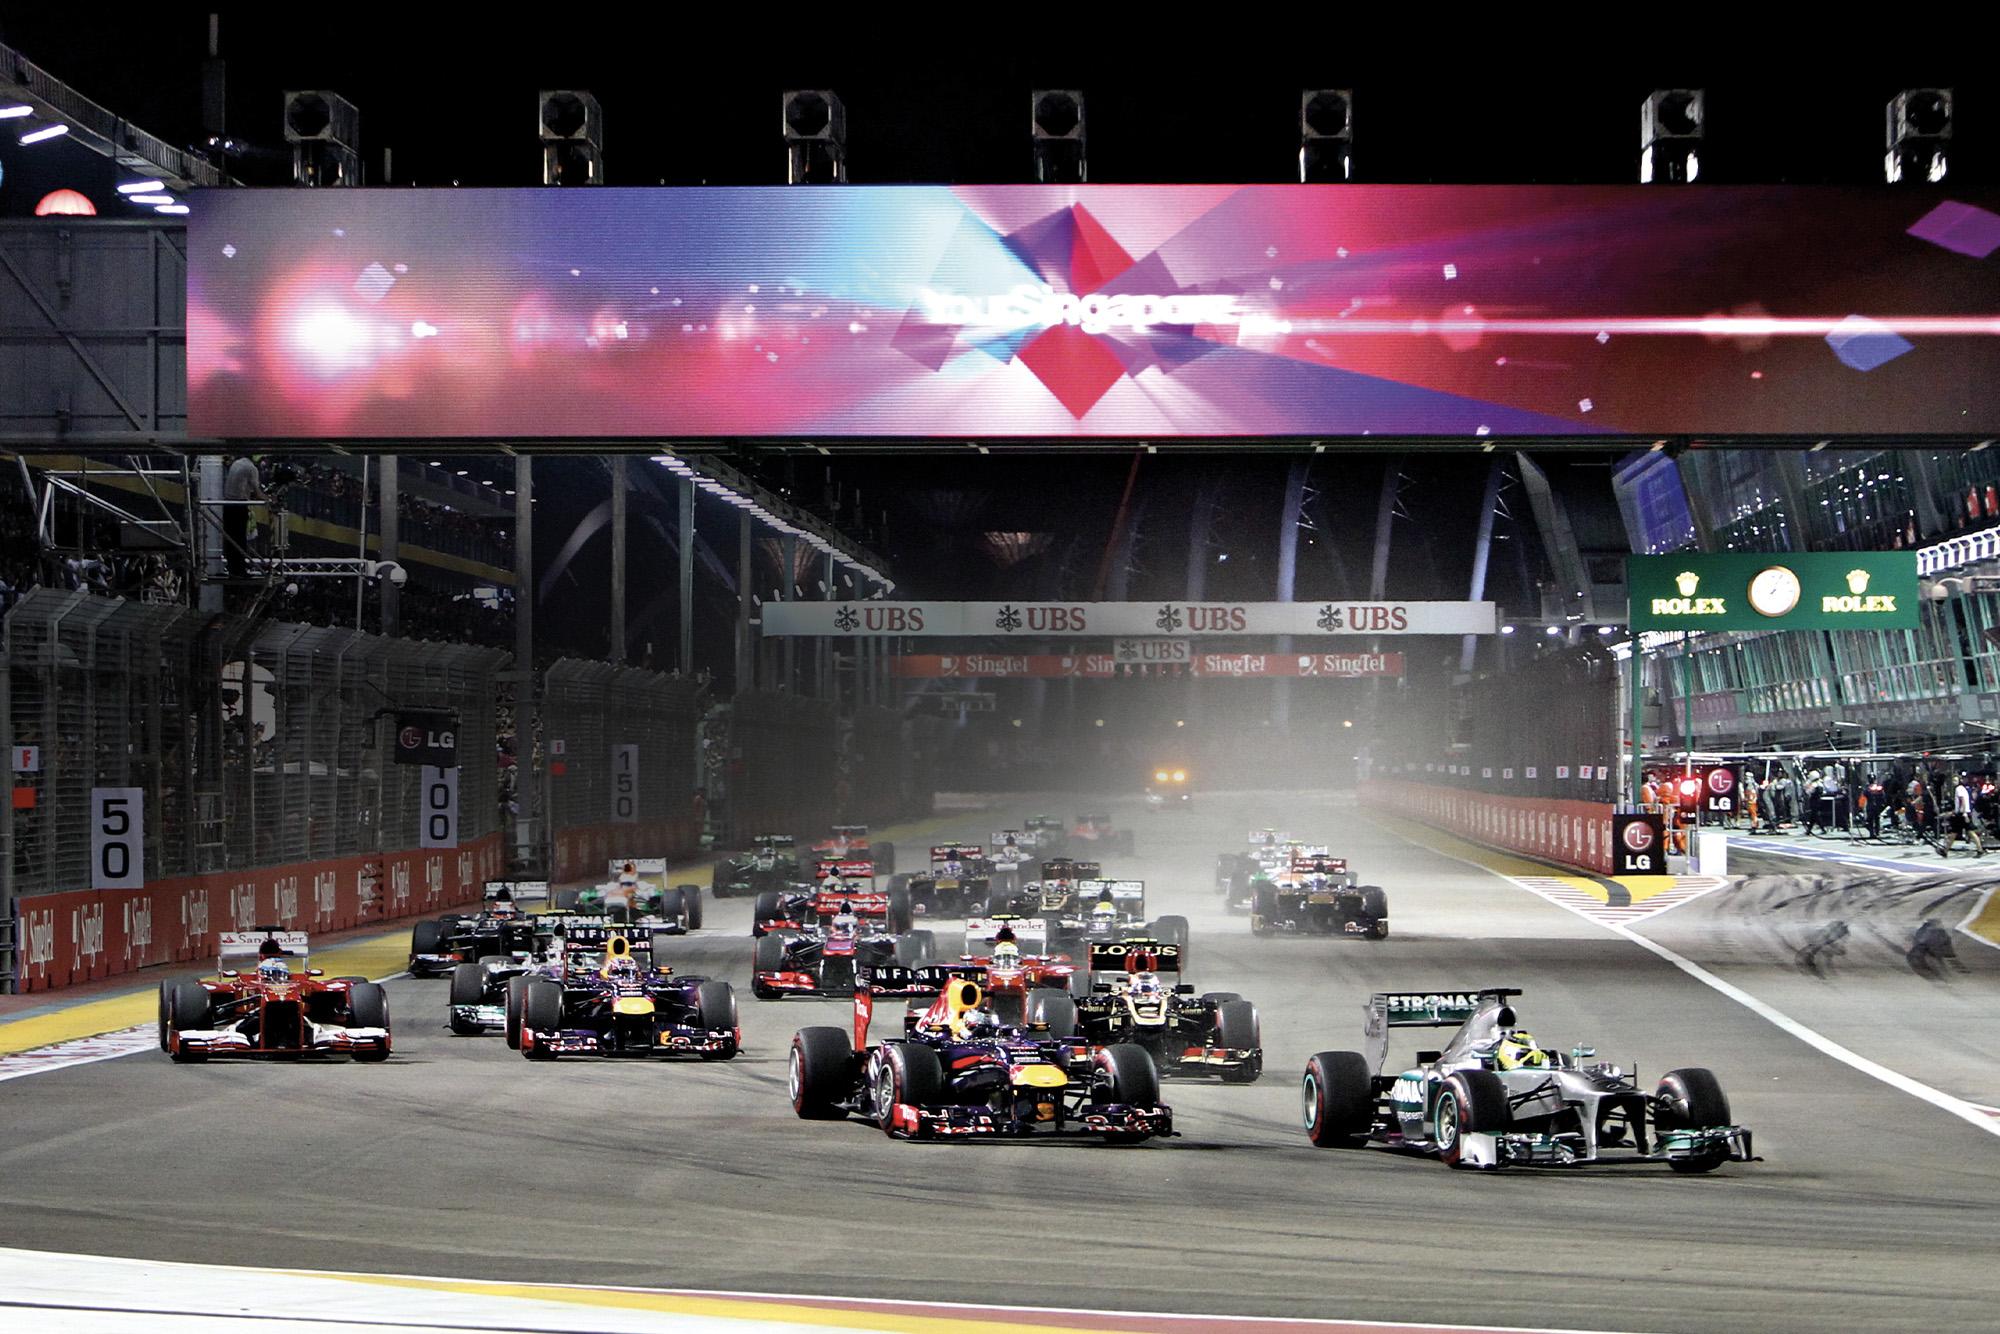 Singapore Grand Prix start